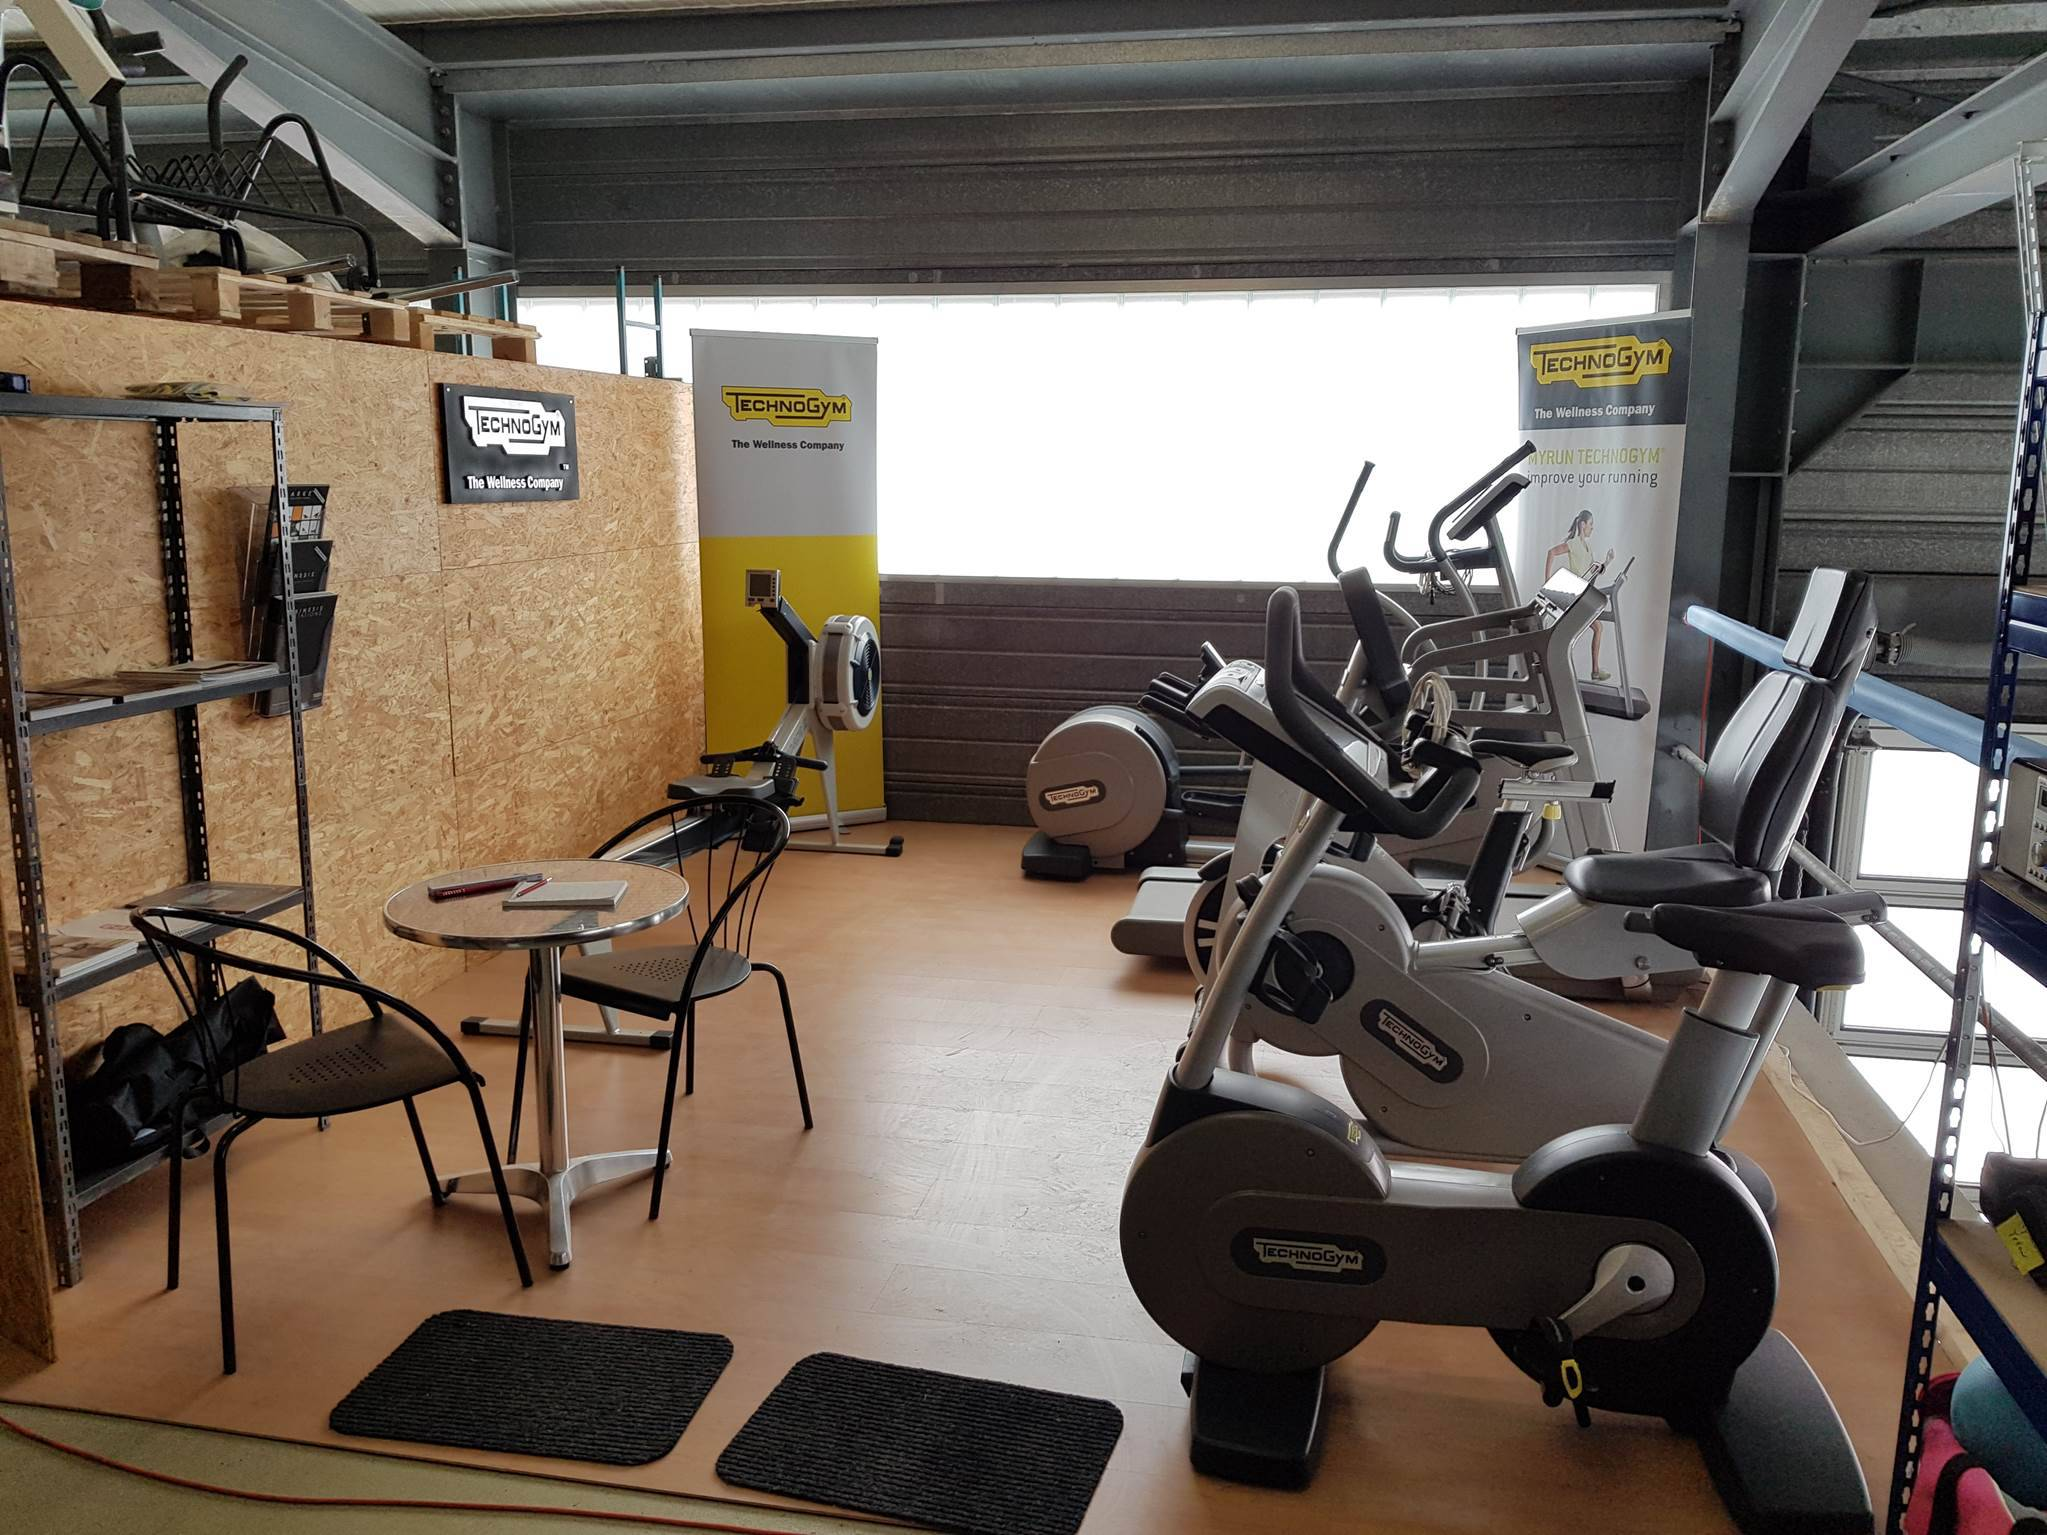 Appareil de musculation occasion appareil musculation poids clasf appareil musculation abdo - Porte de garage 300x240 ...